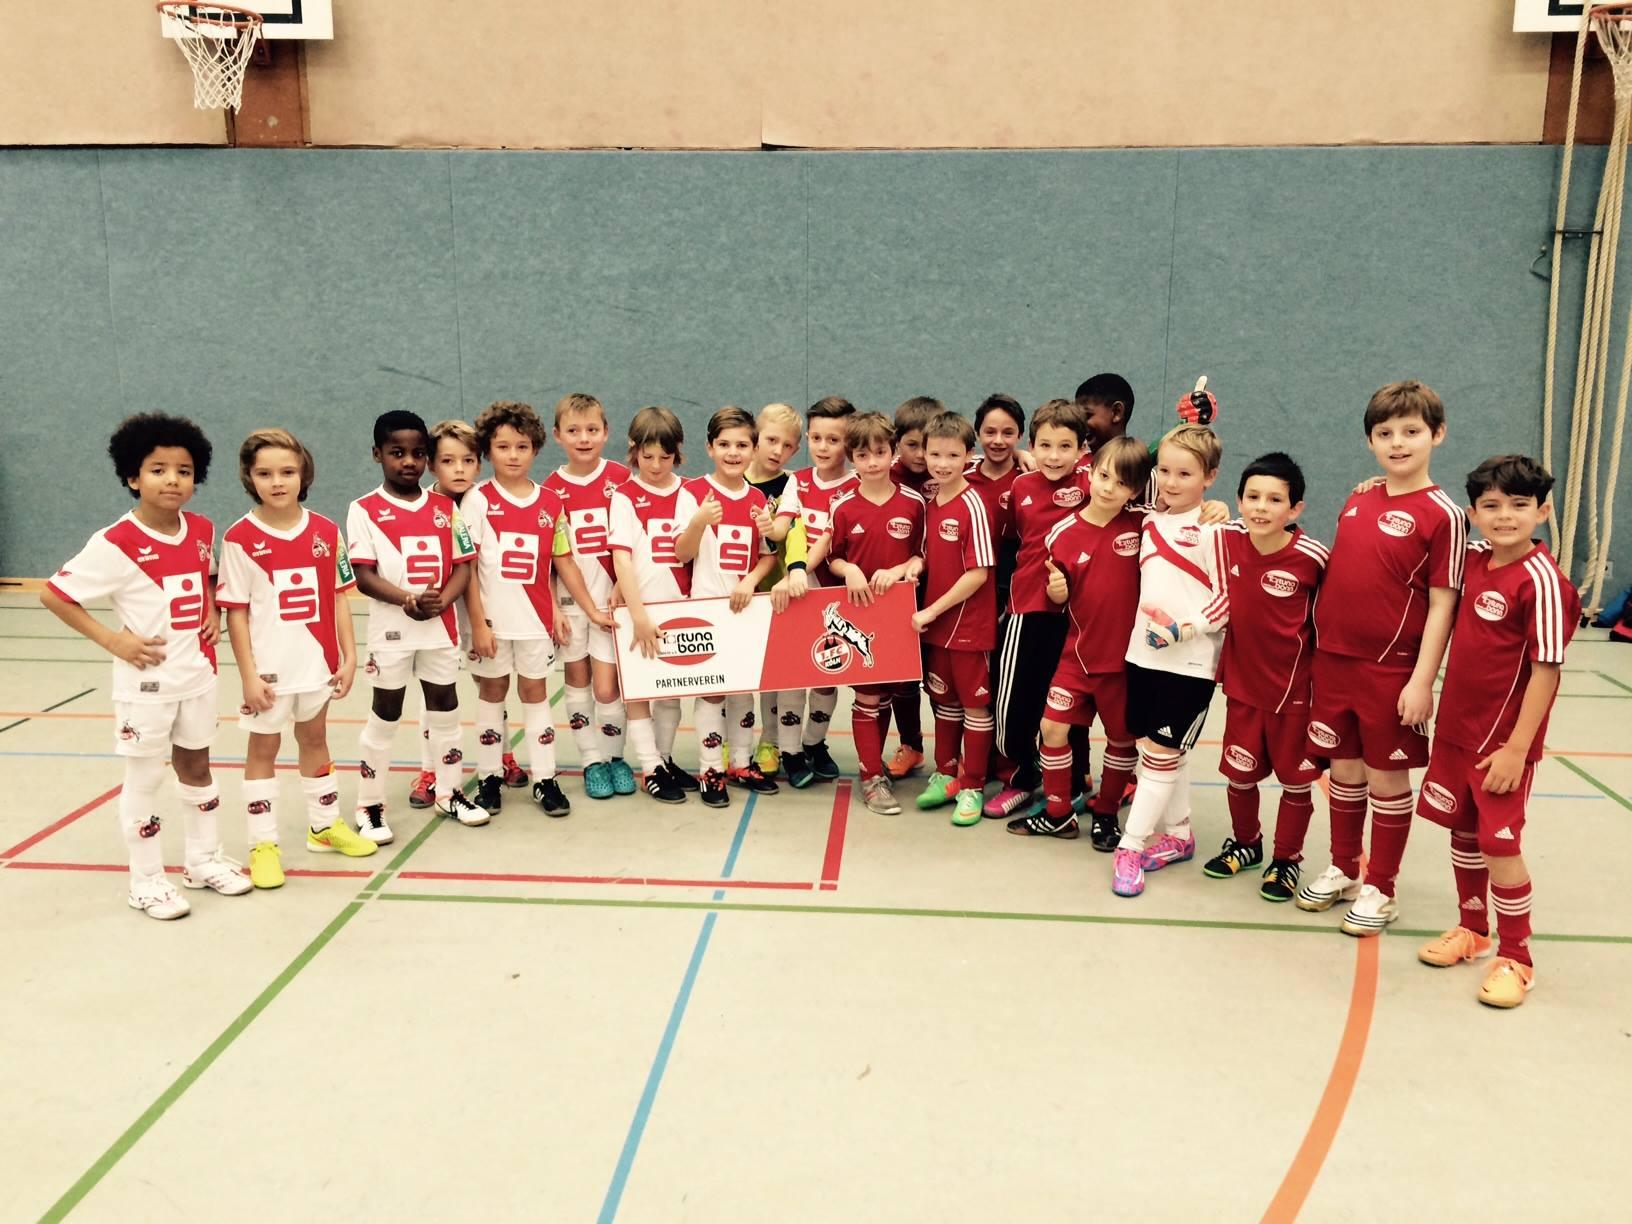 saison_15-16_F-Junioren